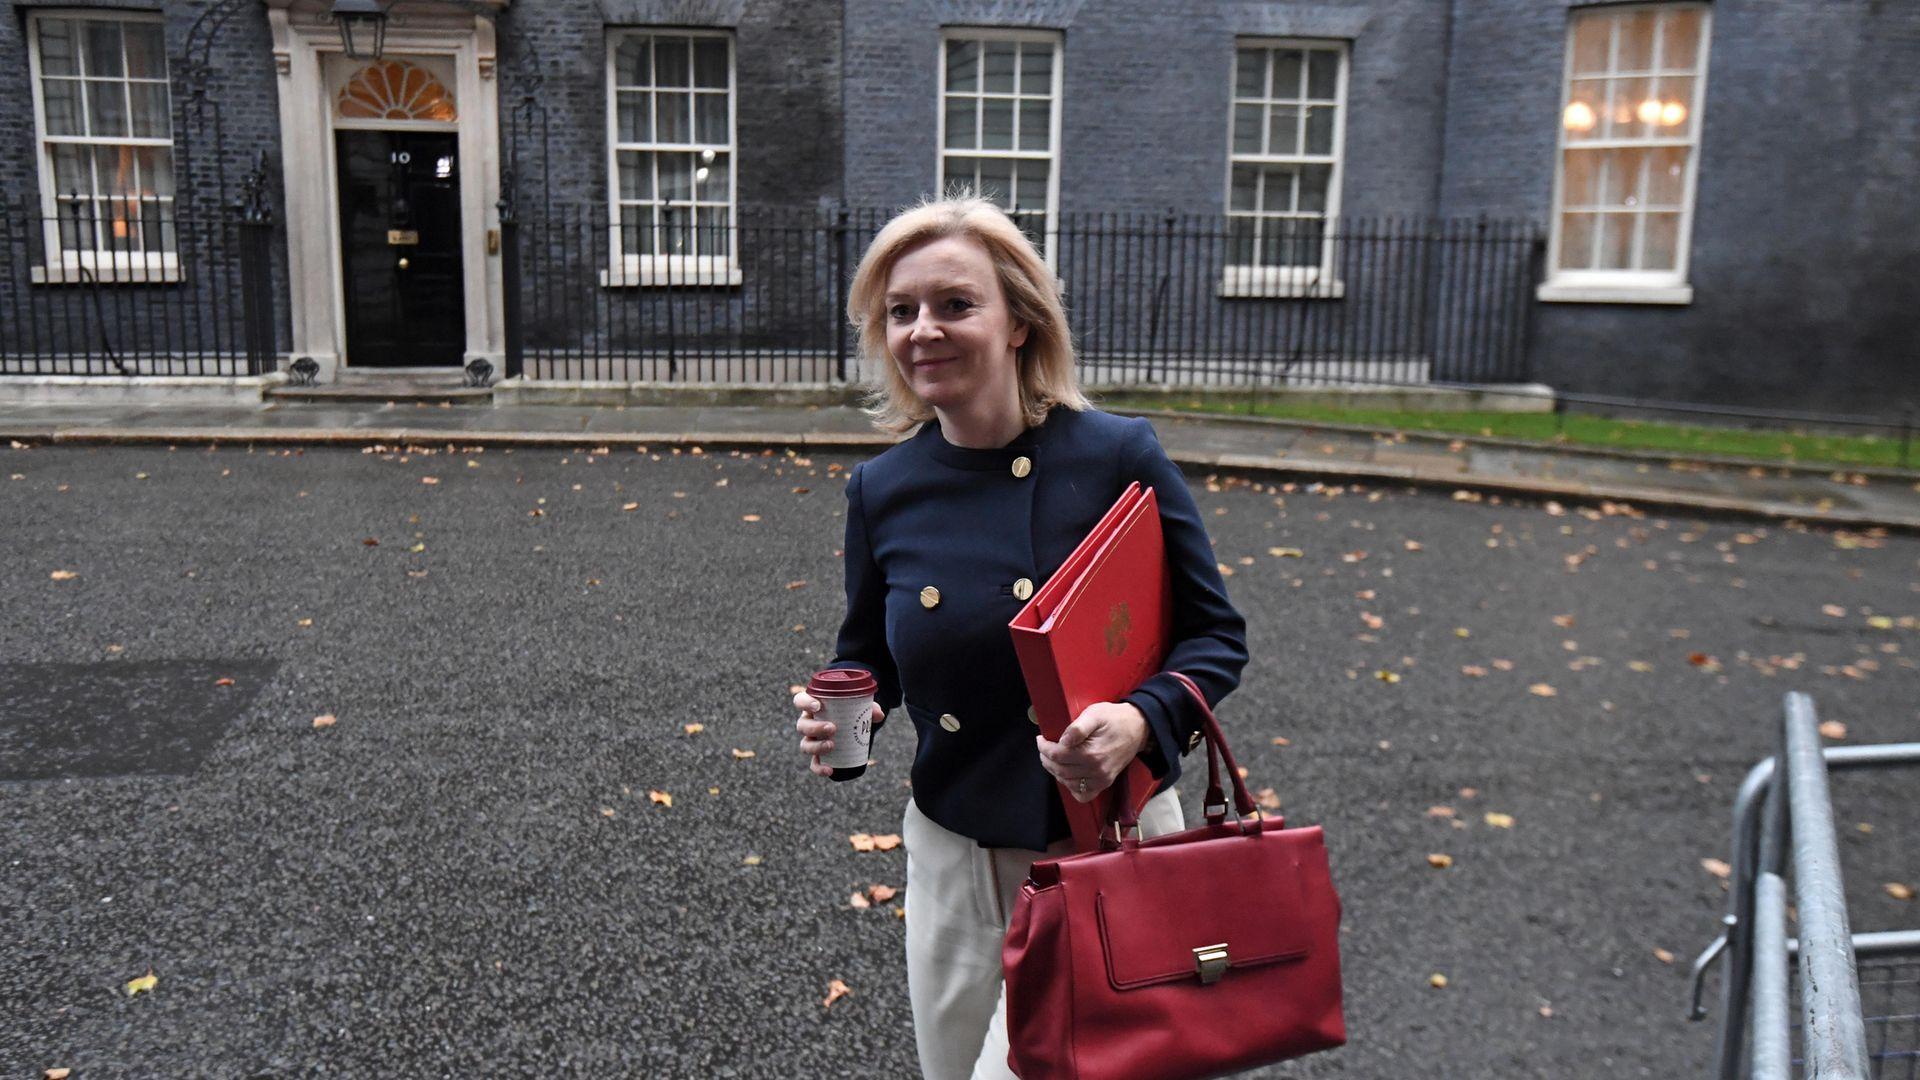 International Trade Secretary Liz Truss arrives in Downing Street London - Credit: PA